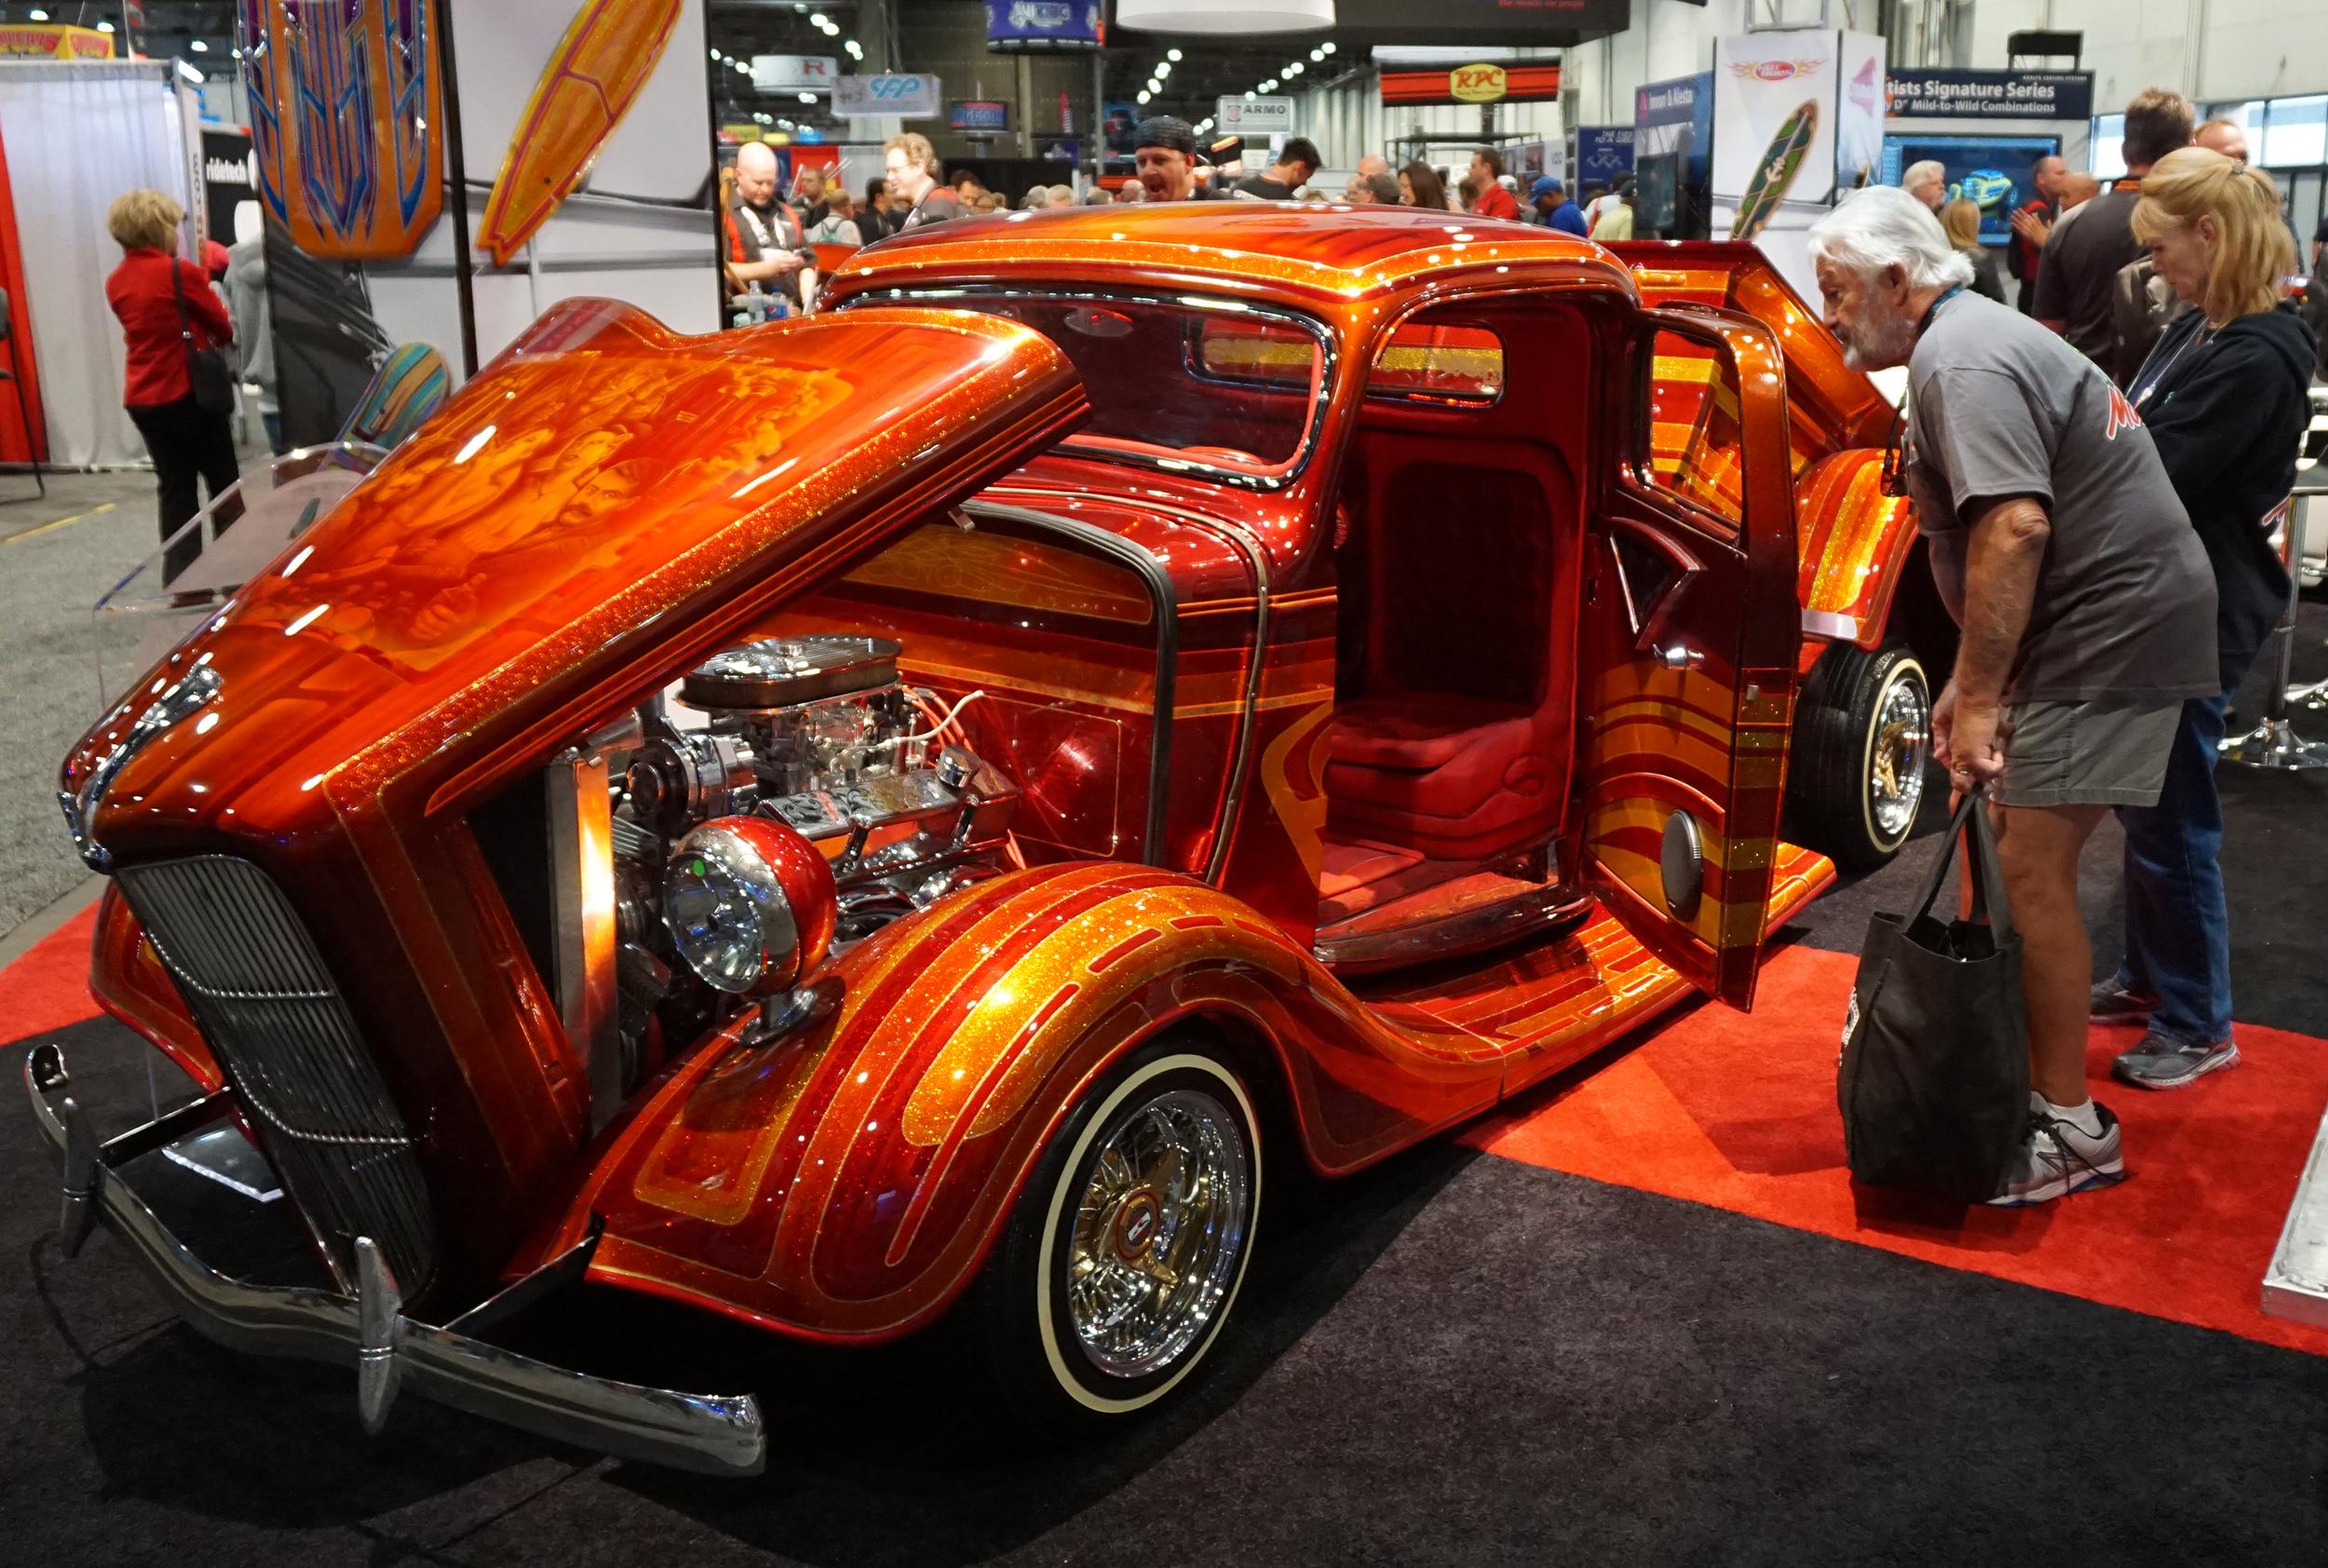 © Eric Bellscheidt, Automotive Content Experience